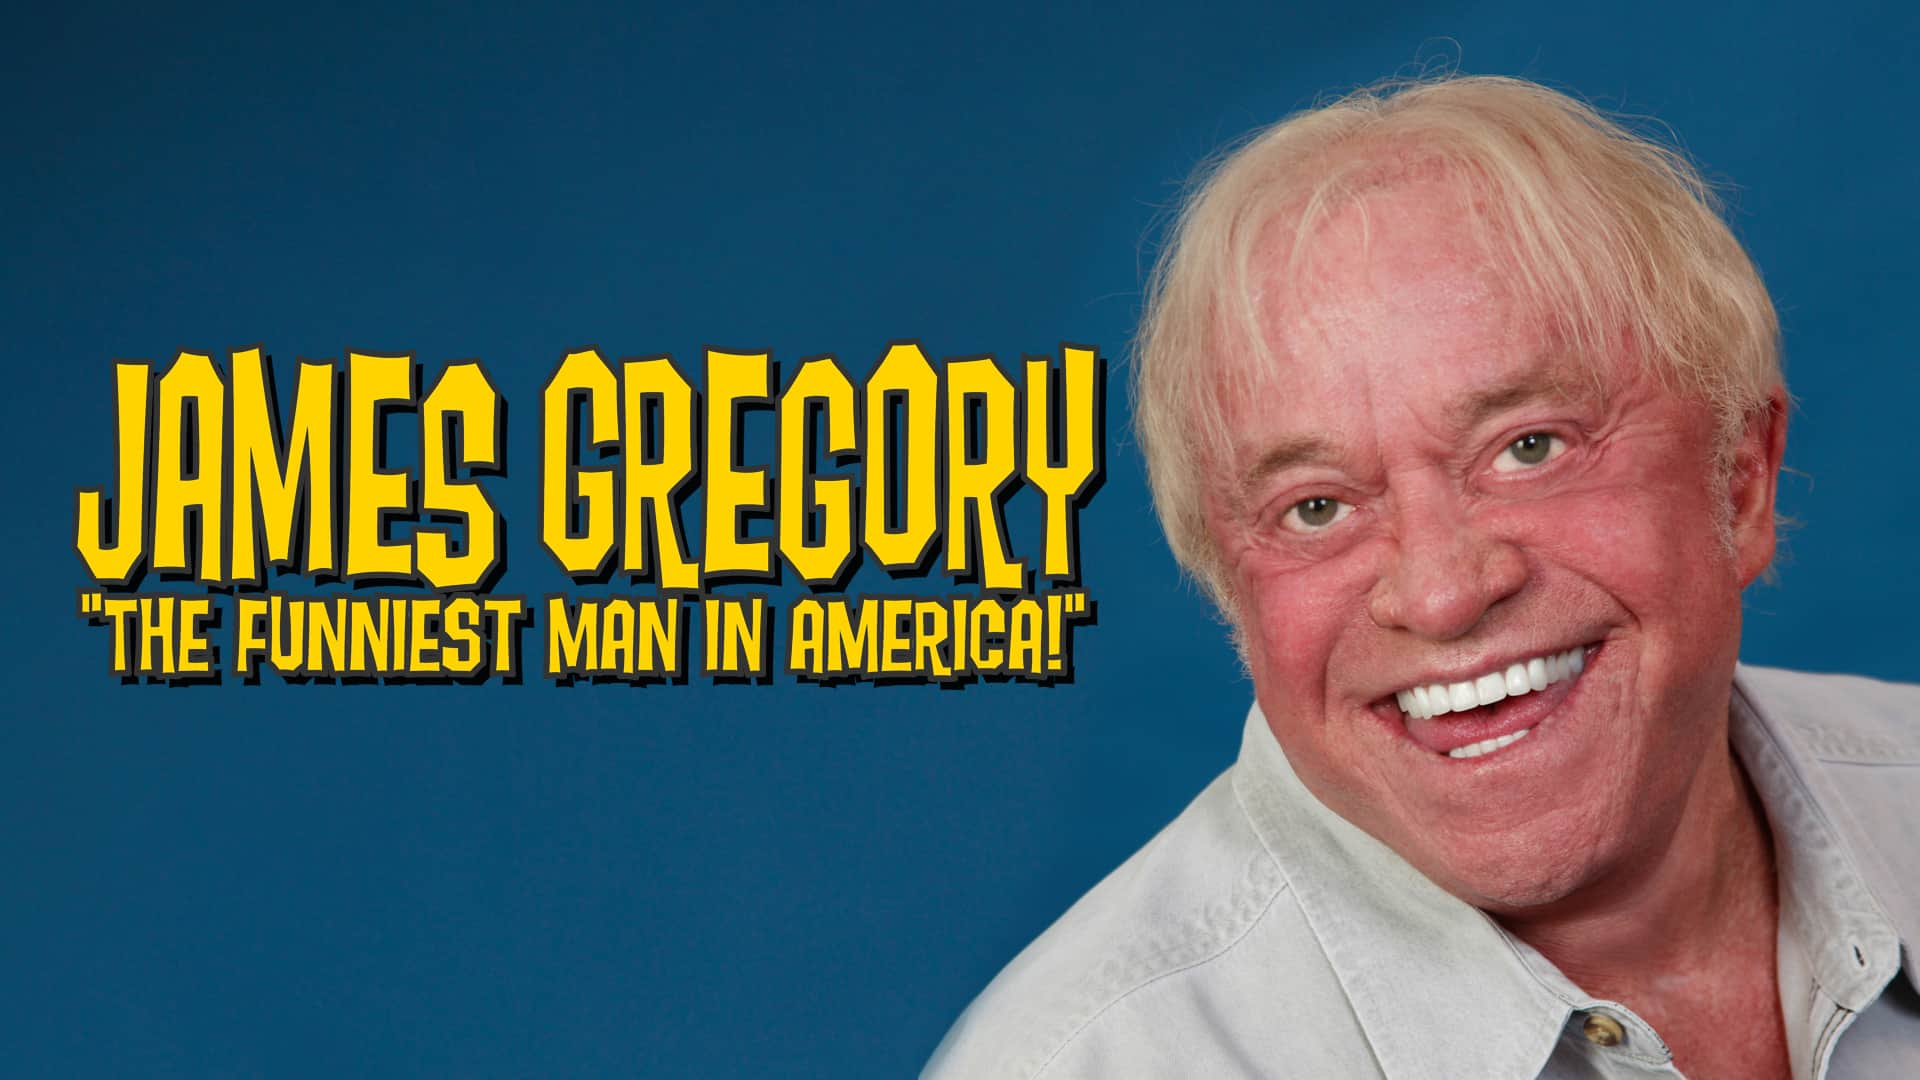 James Gregory Comedian